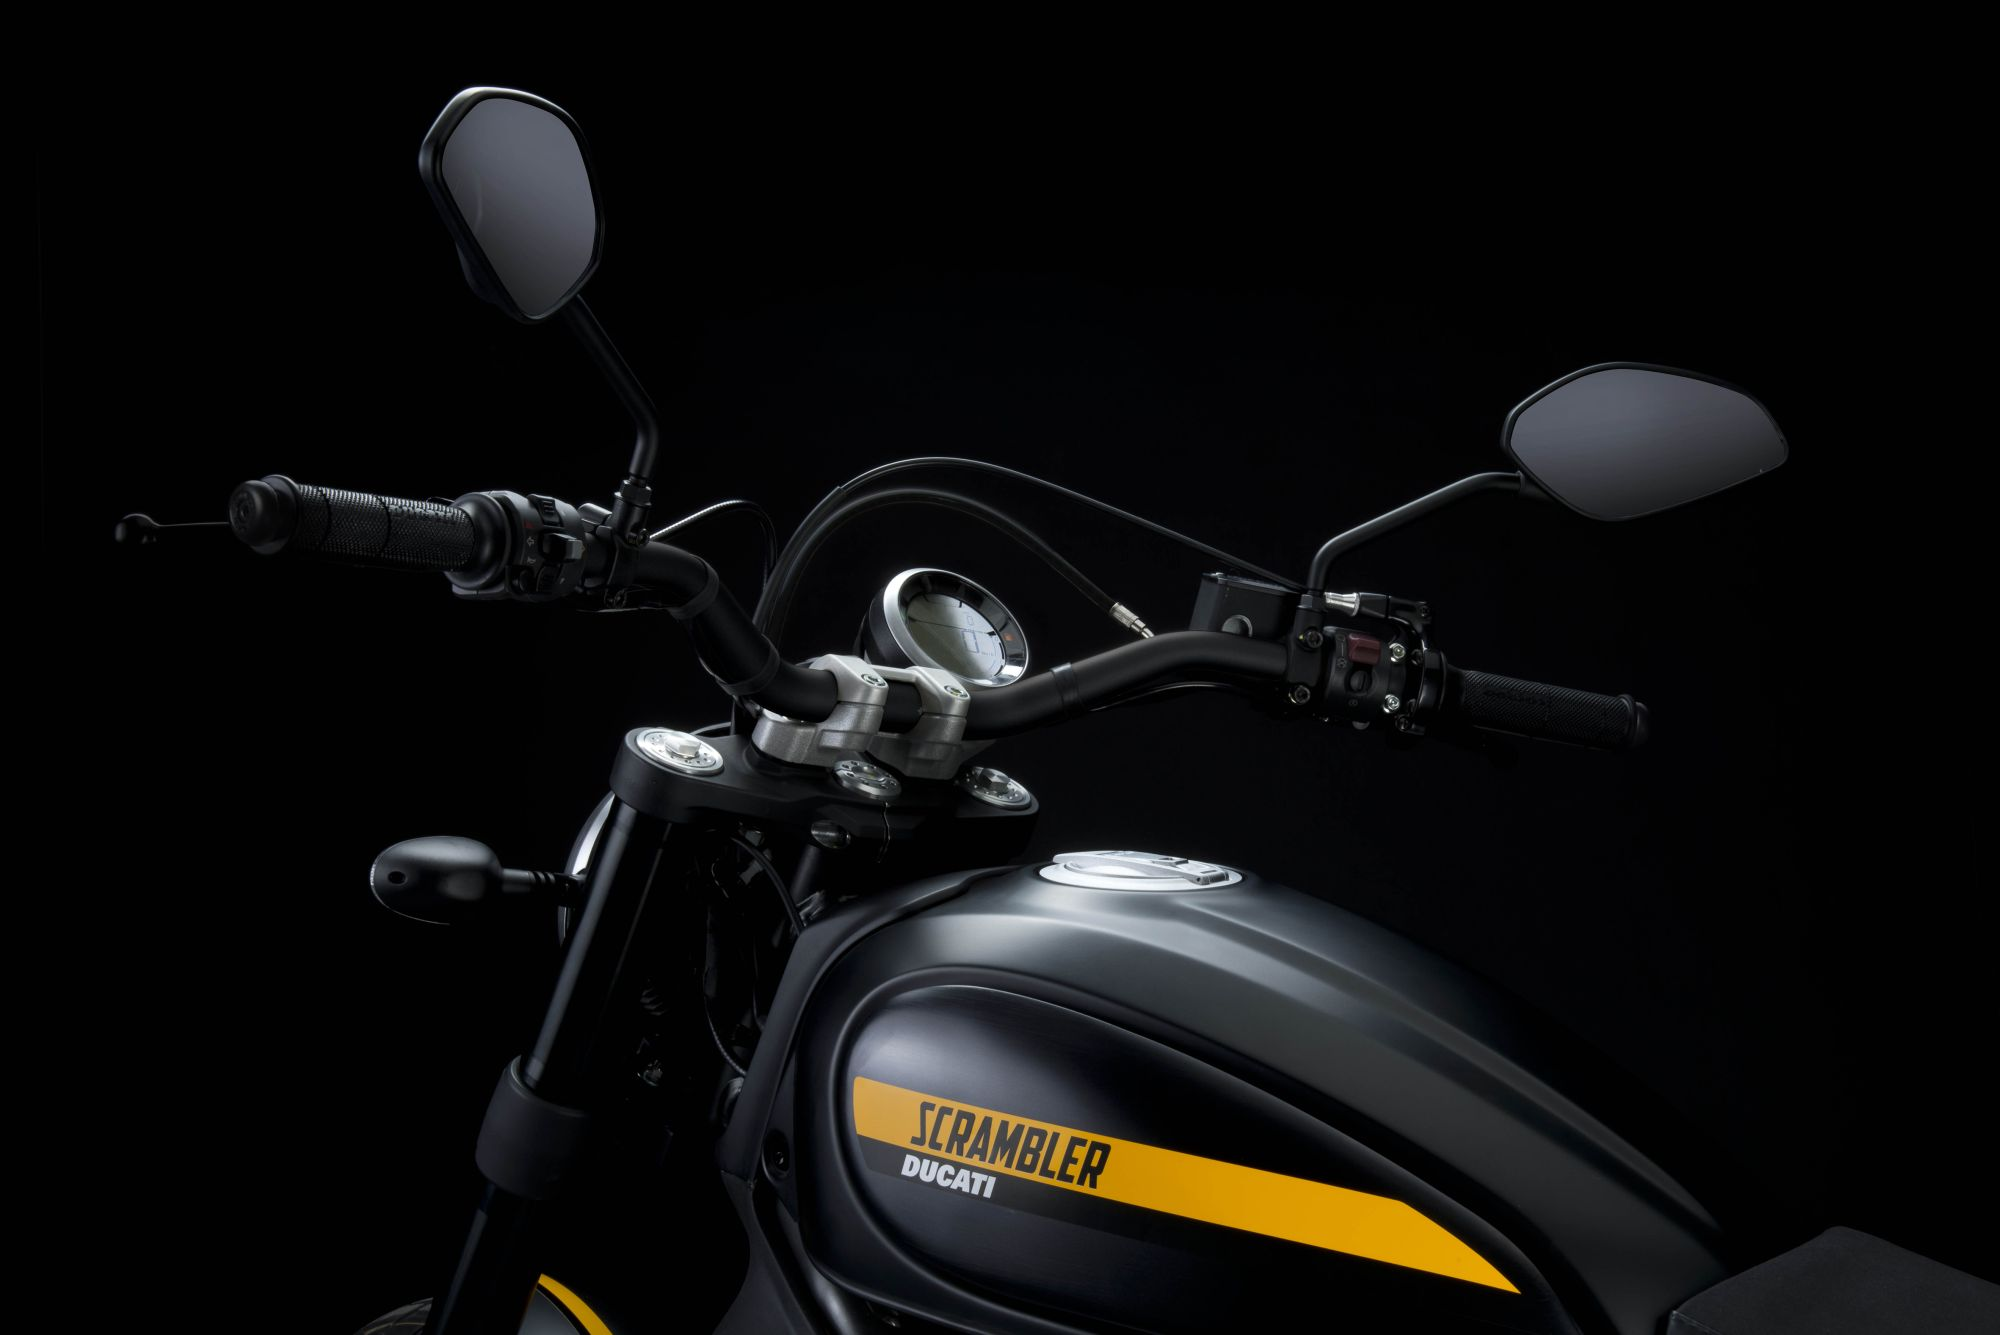 МОТОЦИКЛ DUCATI SCRAMBLER FULL THROTTLE ― Артмото - купить квадроцикл в украине и харькове, мотоцикл, снегоход, скутер, мопед, электромобиль